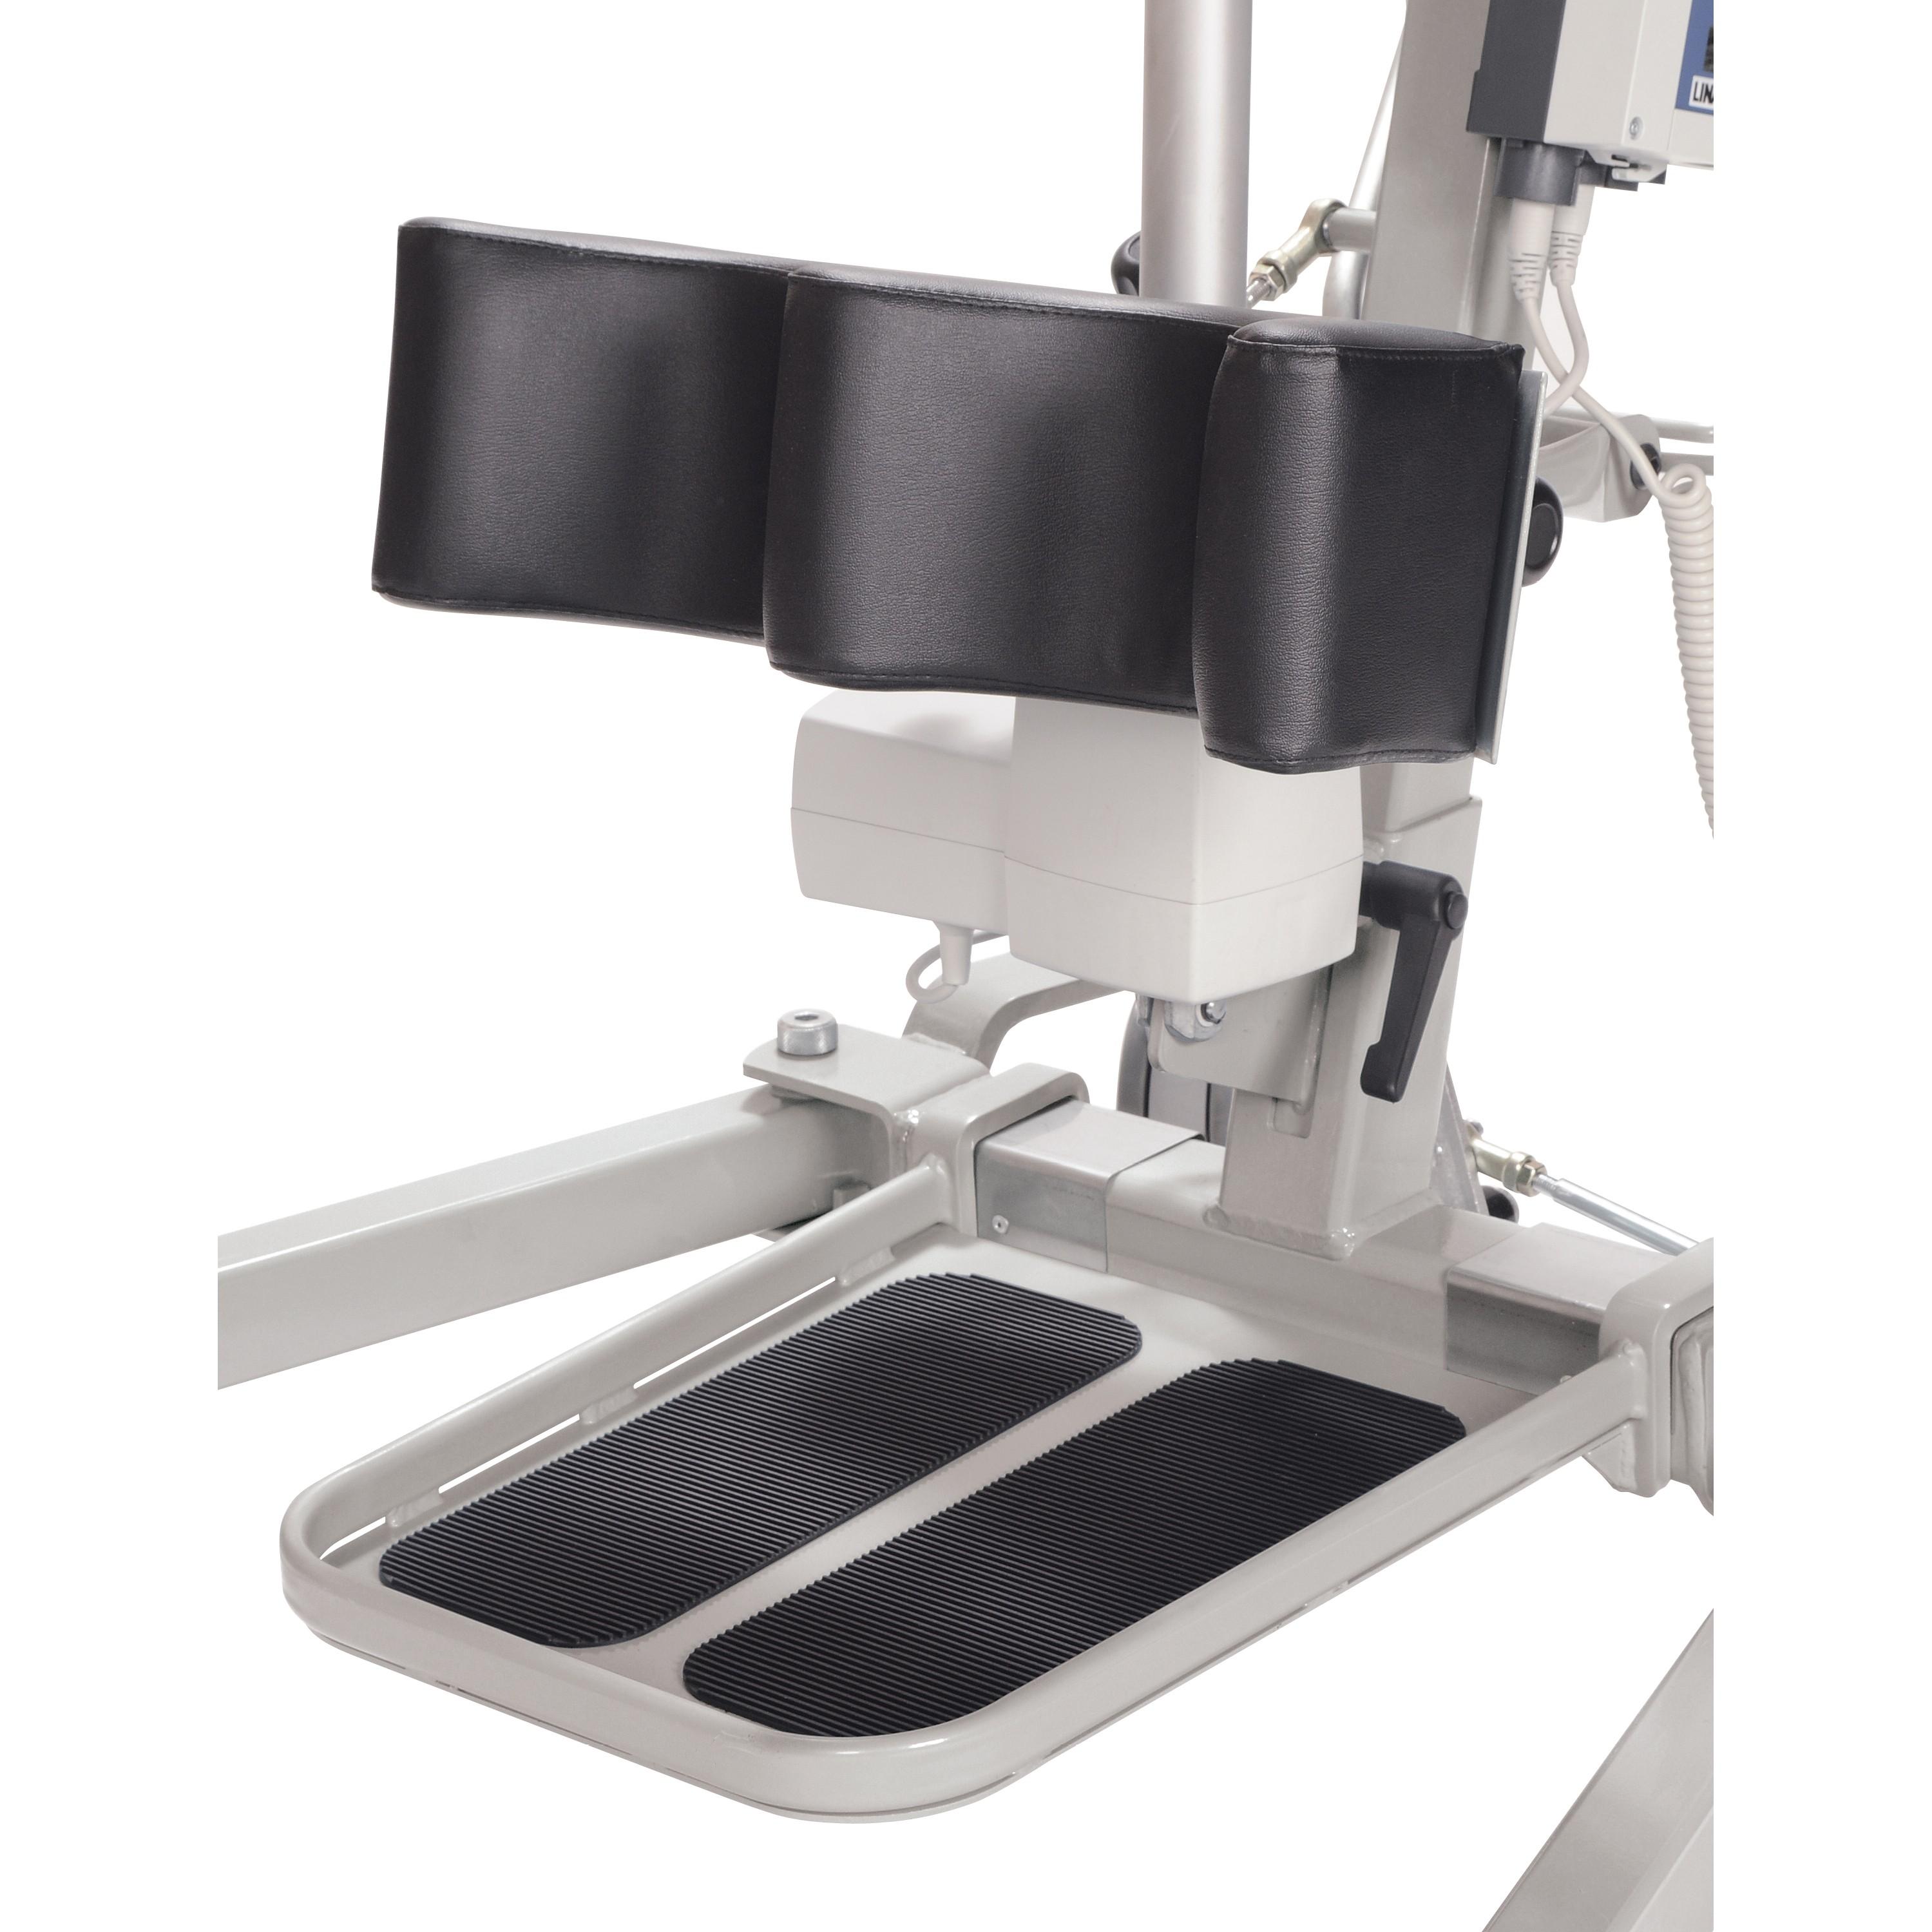 Drive Medical Stand Assist Lift Model 13246